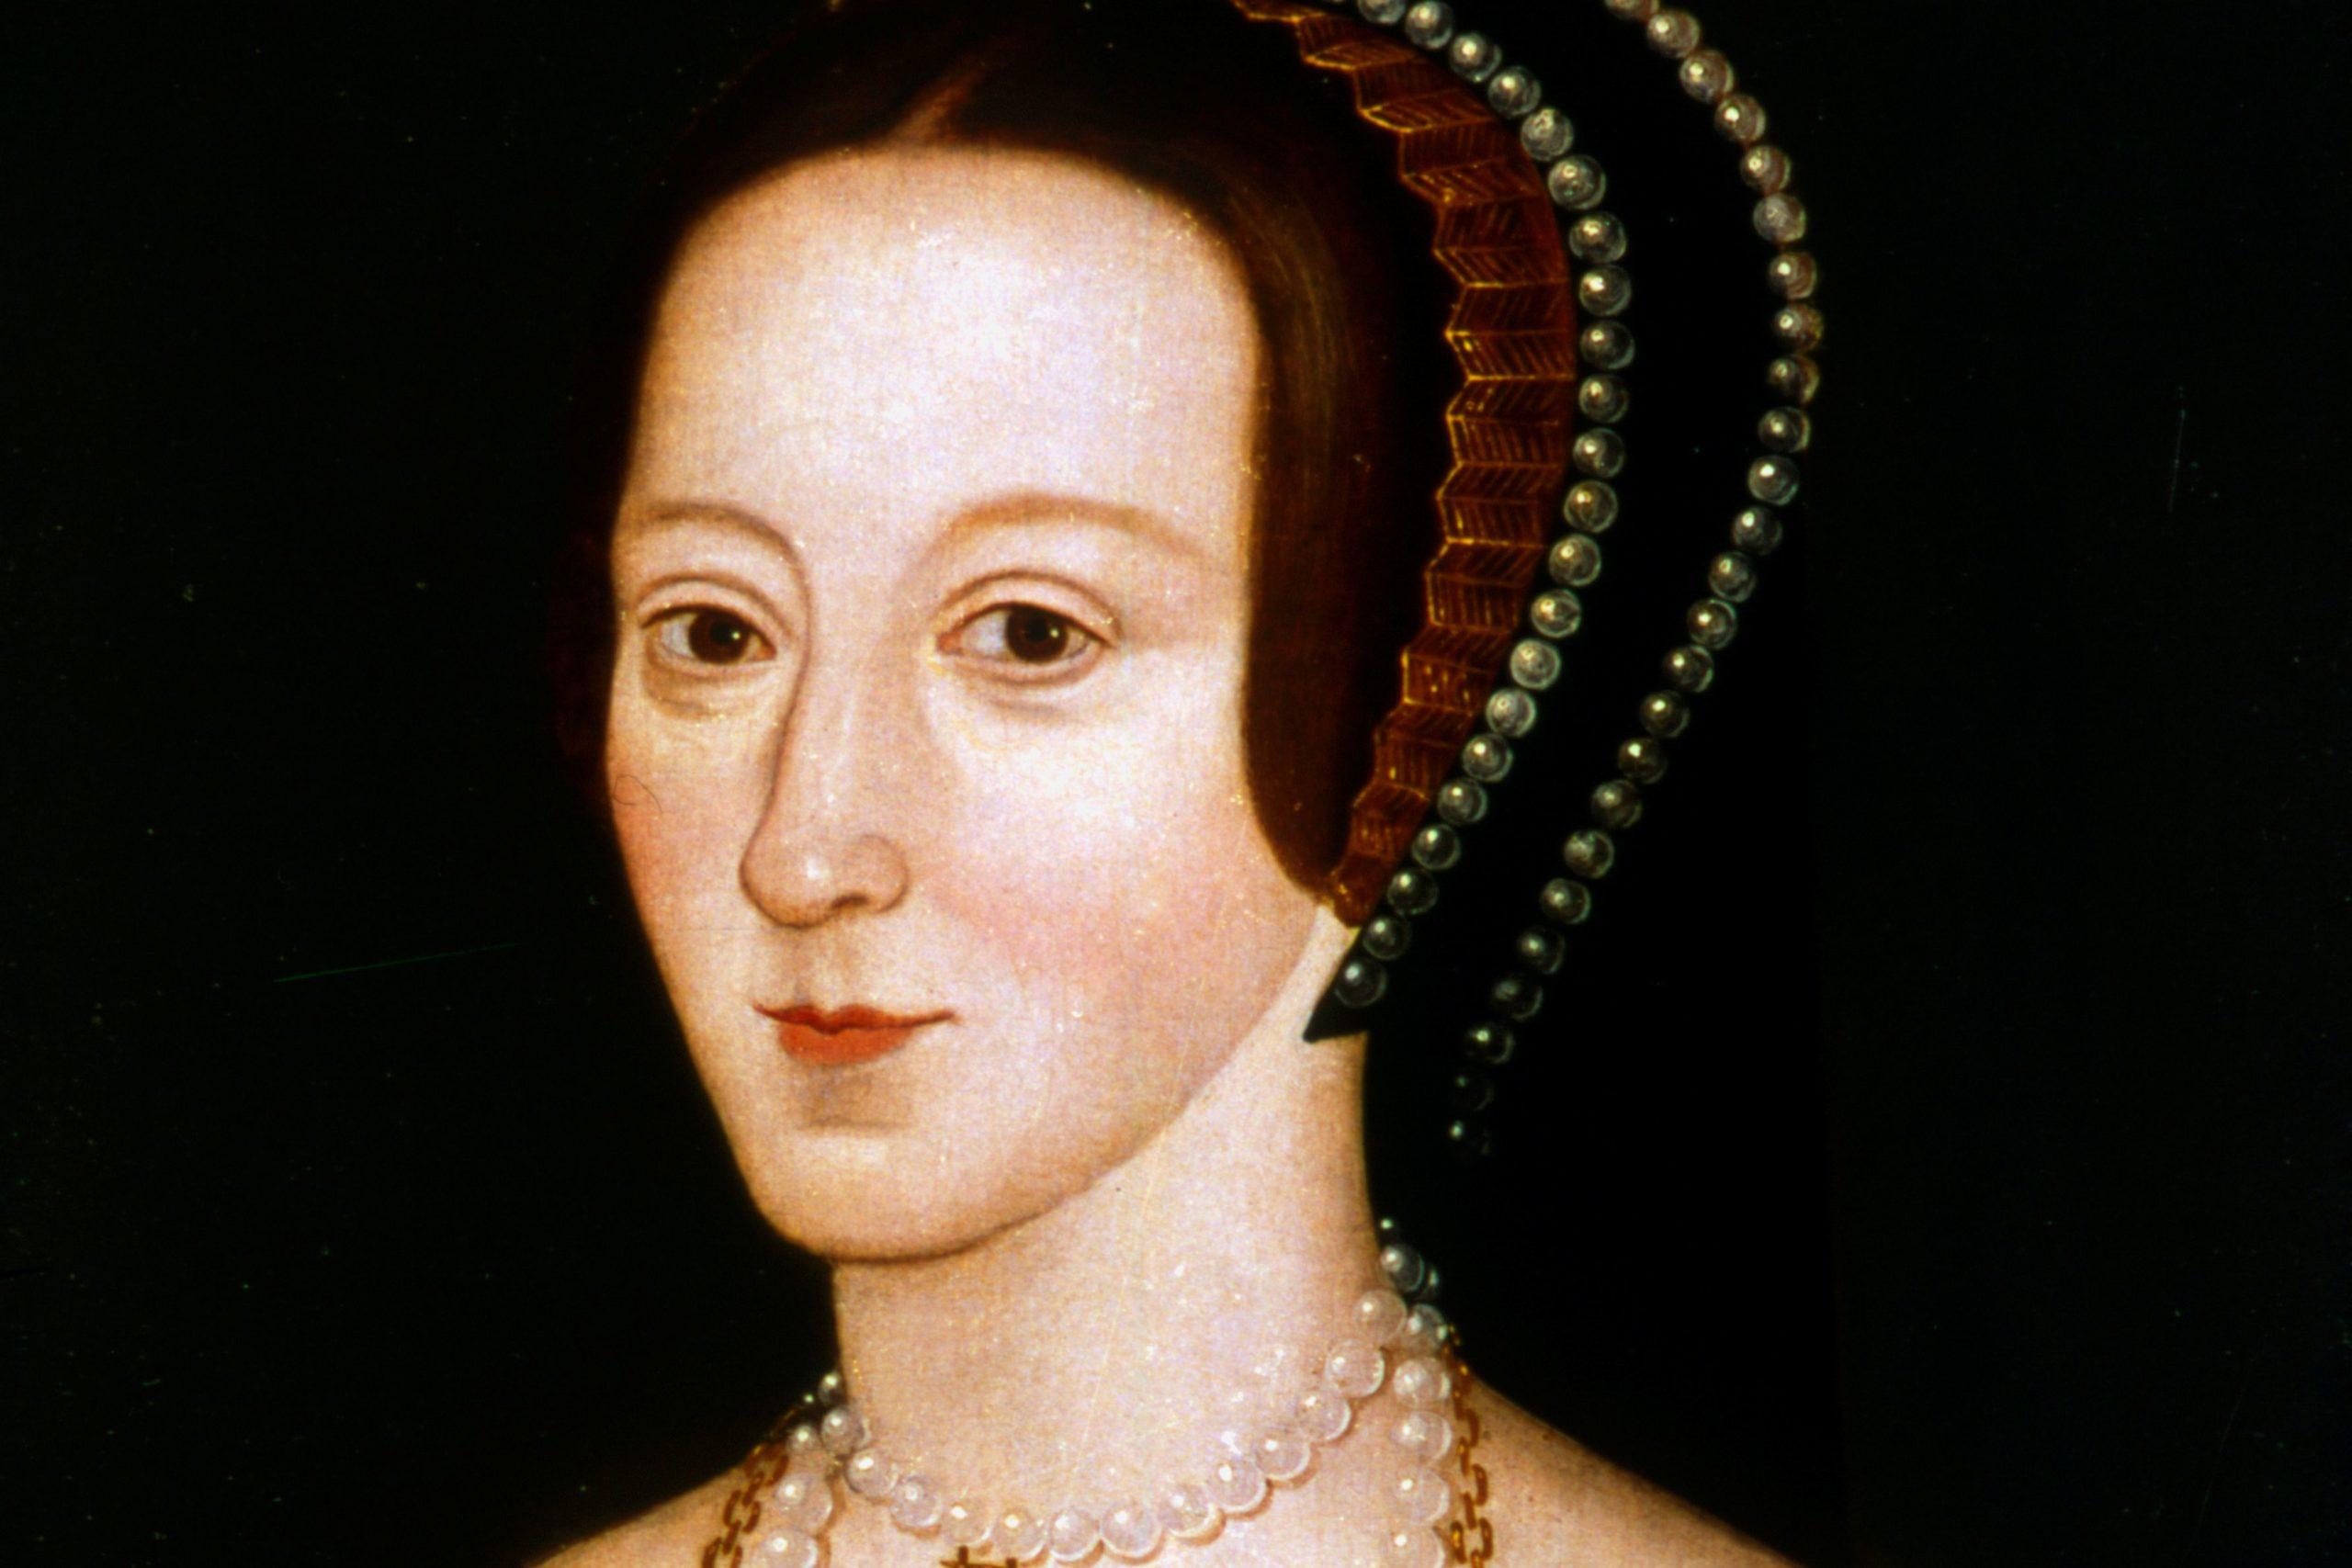 Late Elizabethan portrait of Anne Boleyn, possibly derived from a lost original of 1533–36